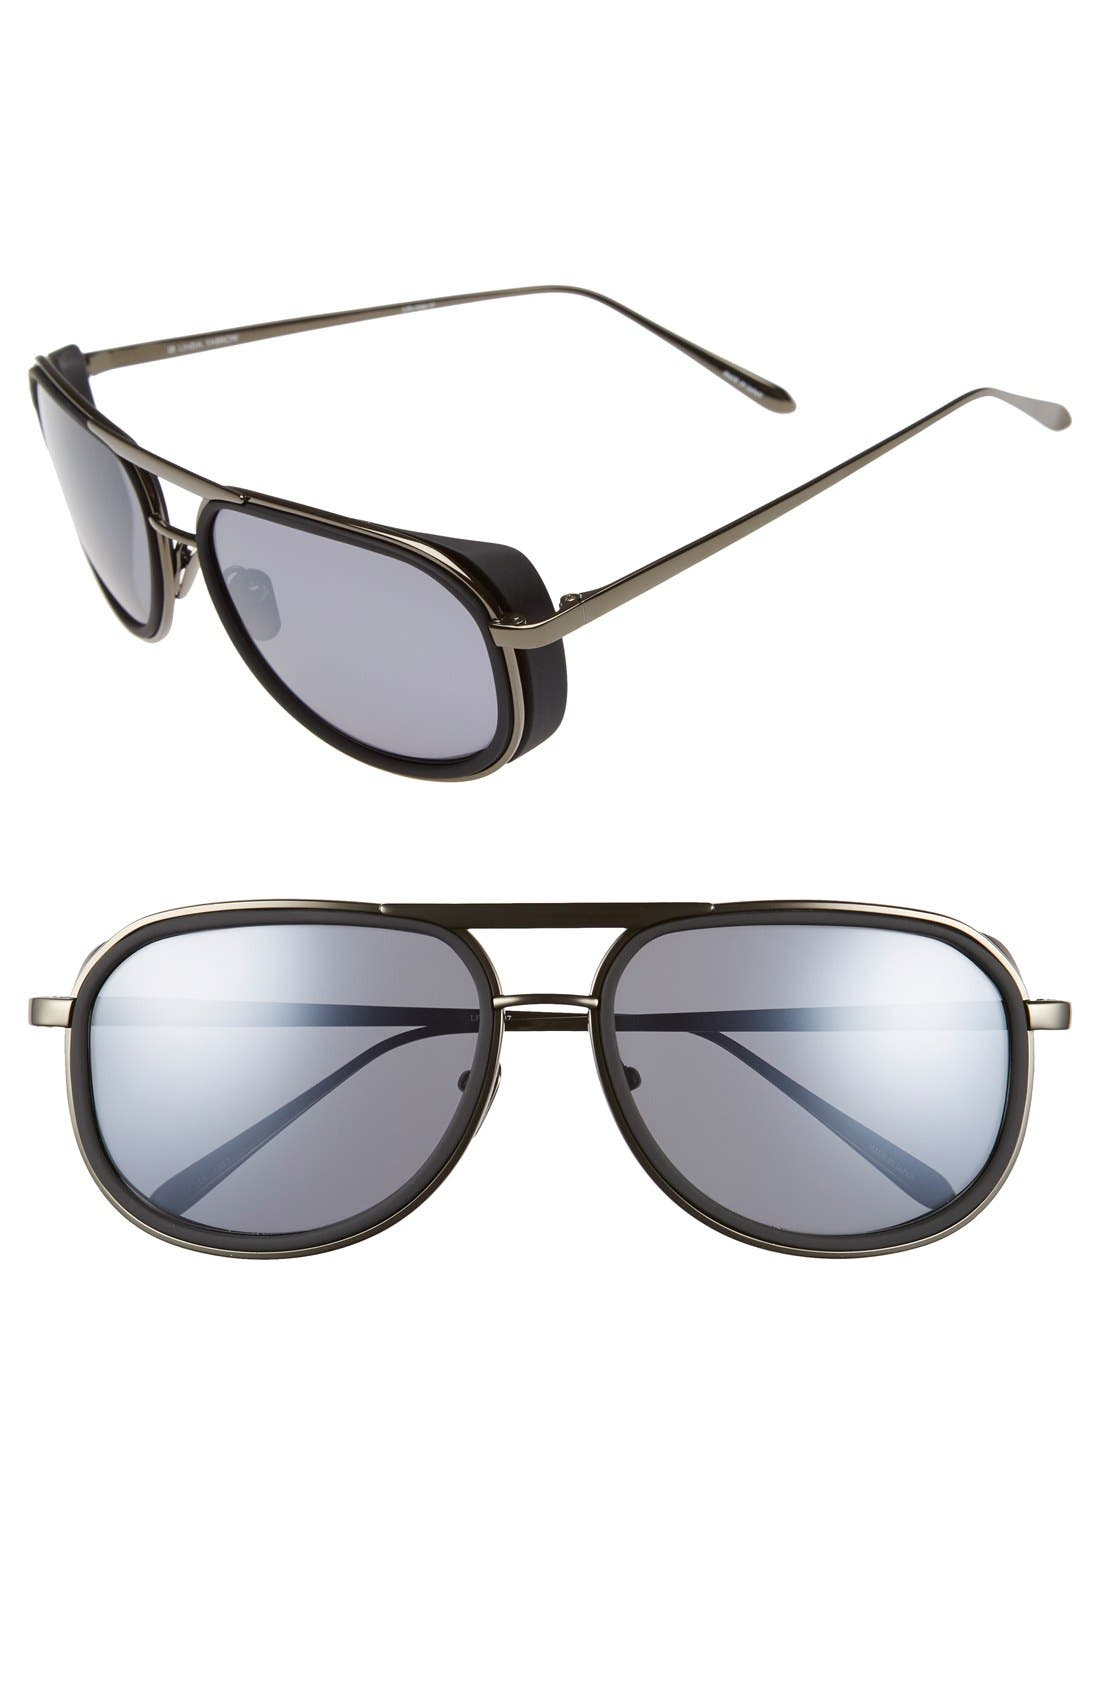 Main Image - Linda Farrow 58mm Sunglasses